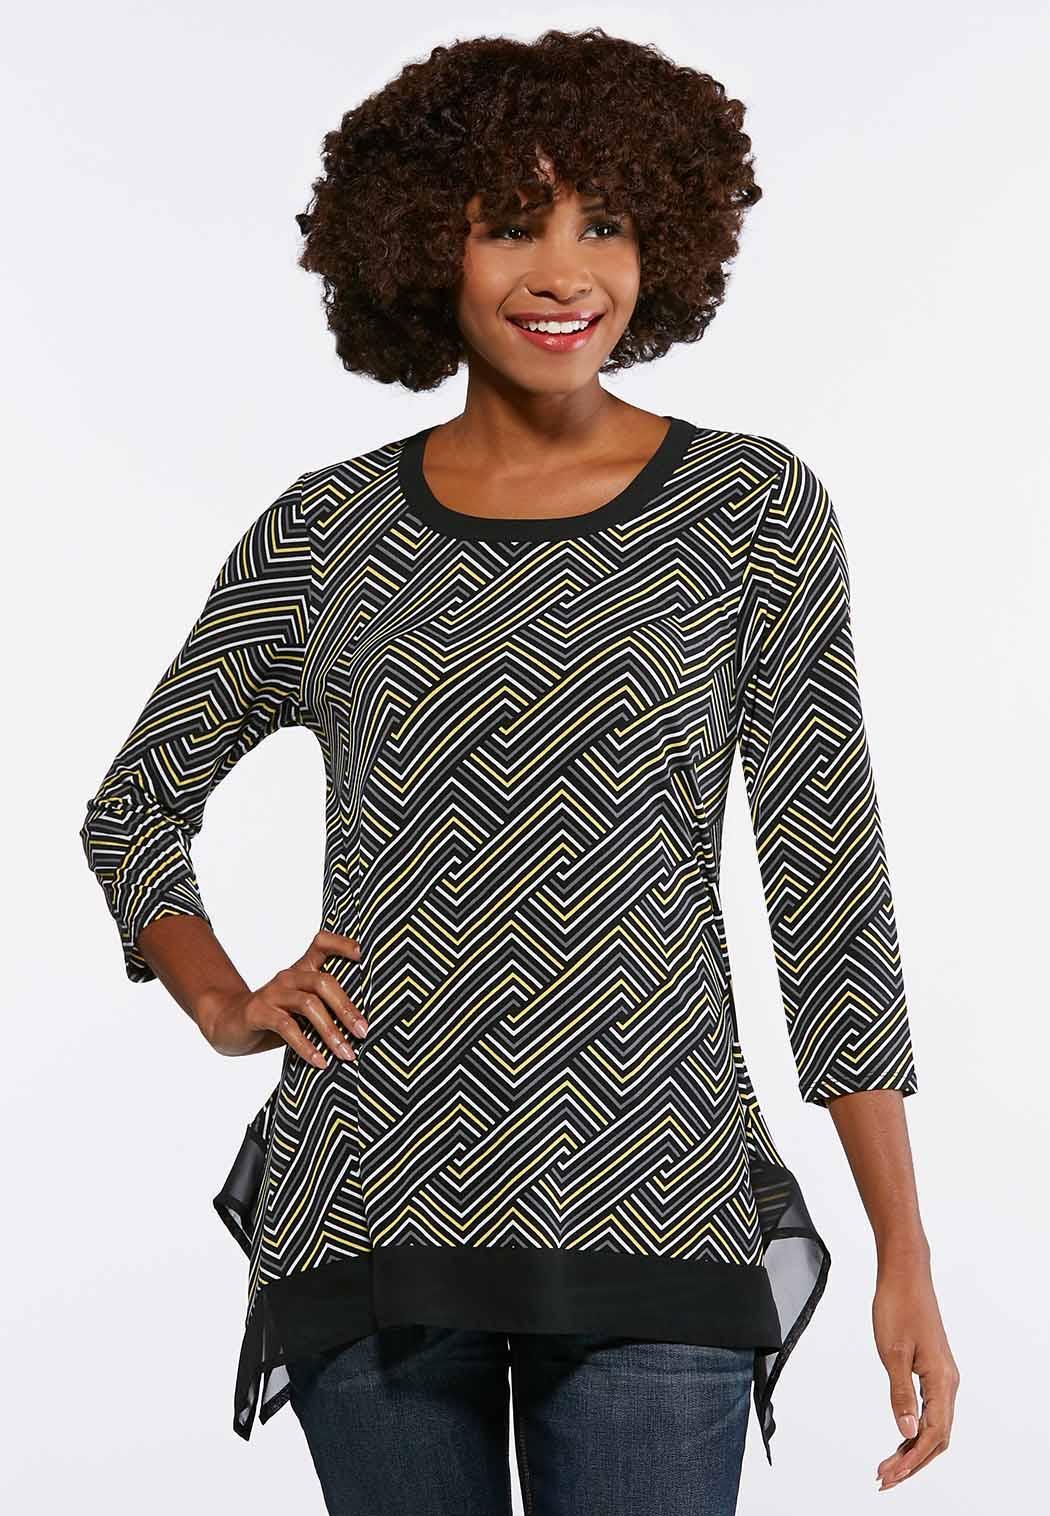 106024c7bfcf3 Women s Plus Size Tees   Knit Tops